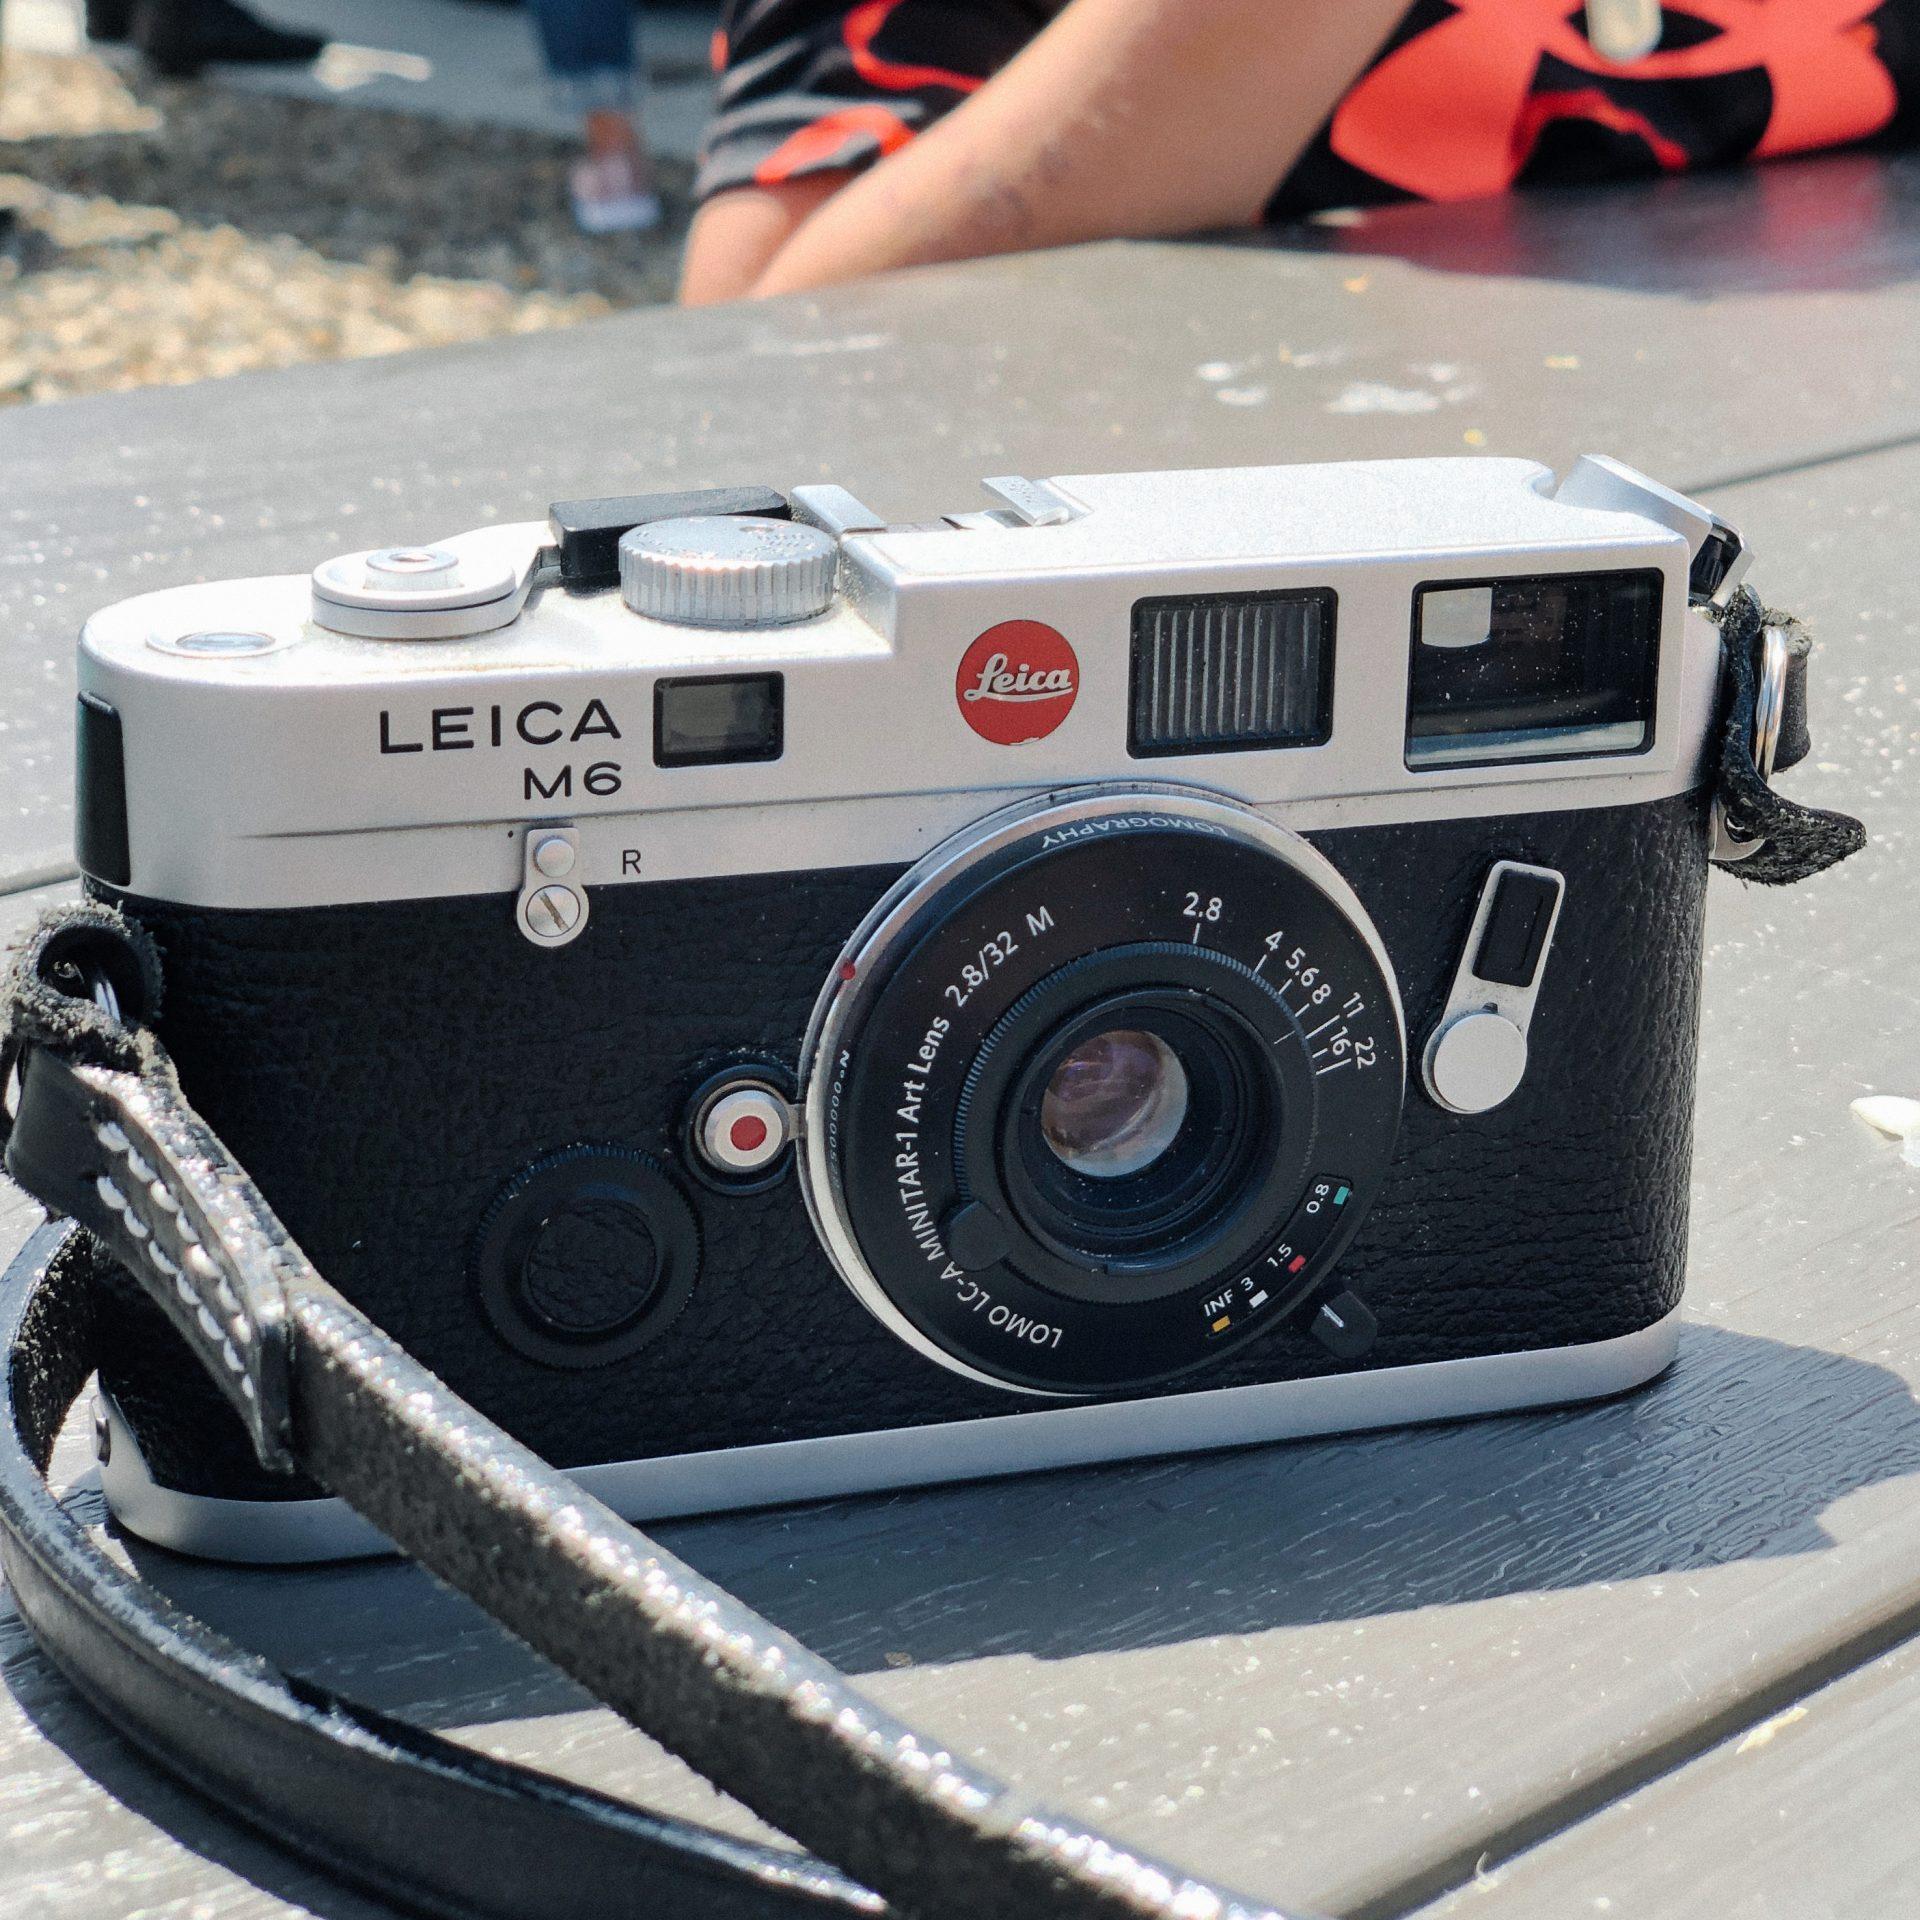 Leica M6, Lomography Minitar